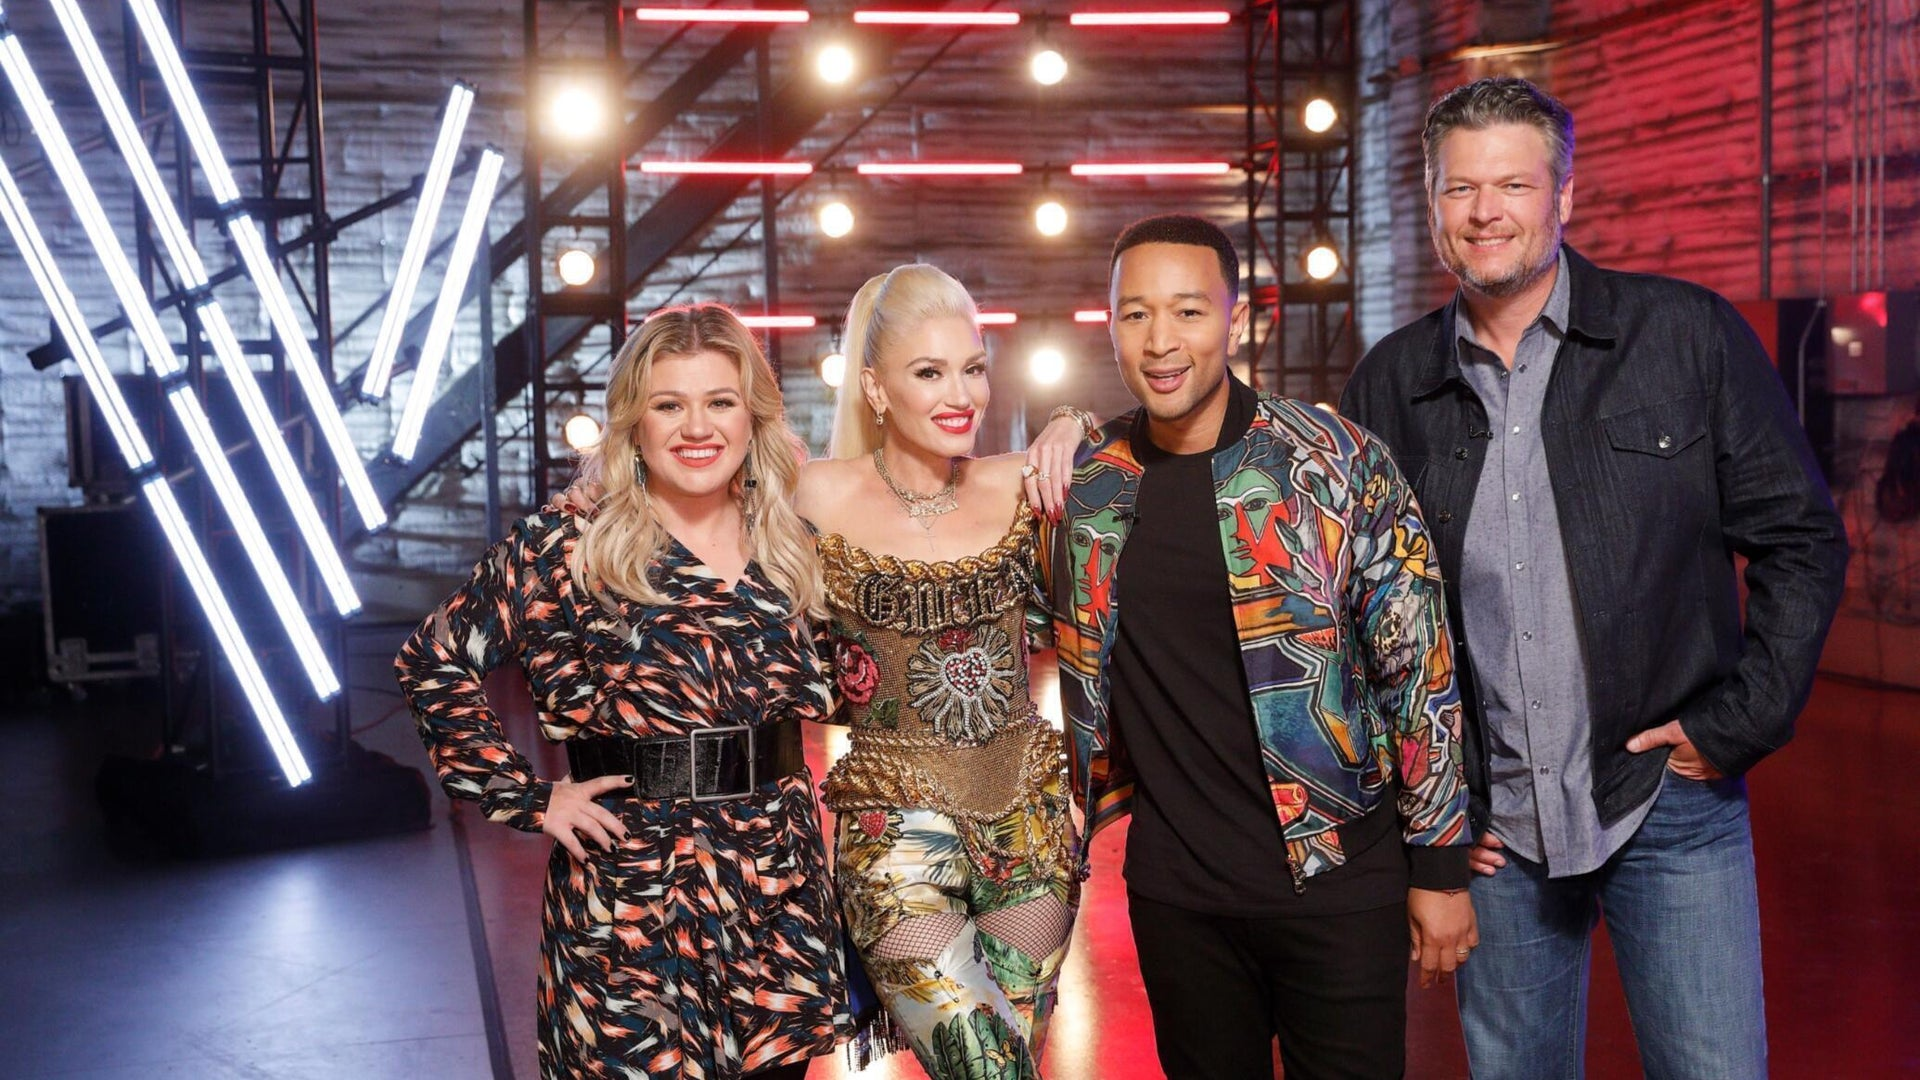 Kelly Clarkson, Gwen Stefani, John Legend, and Blake Shelton, The Voice